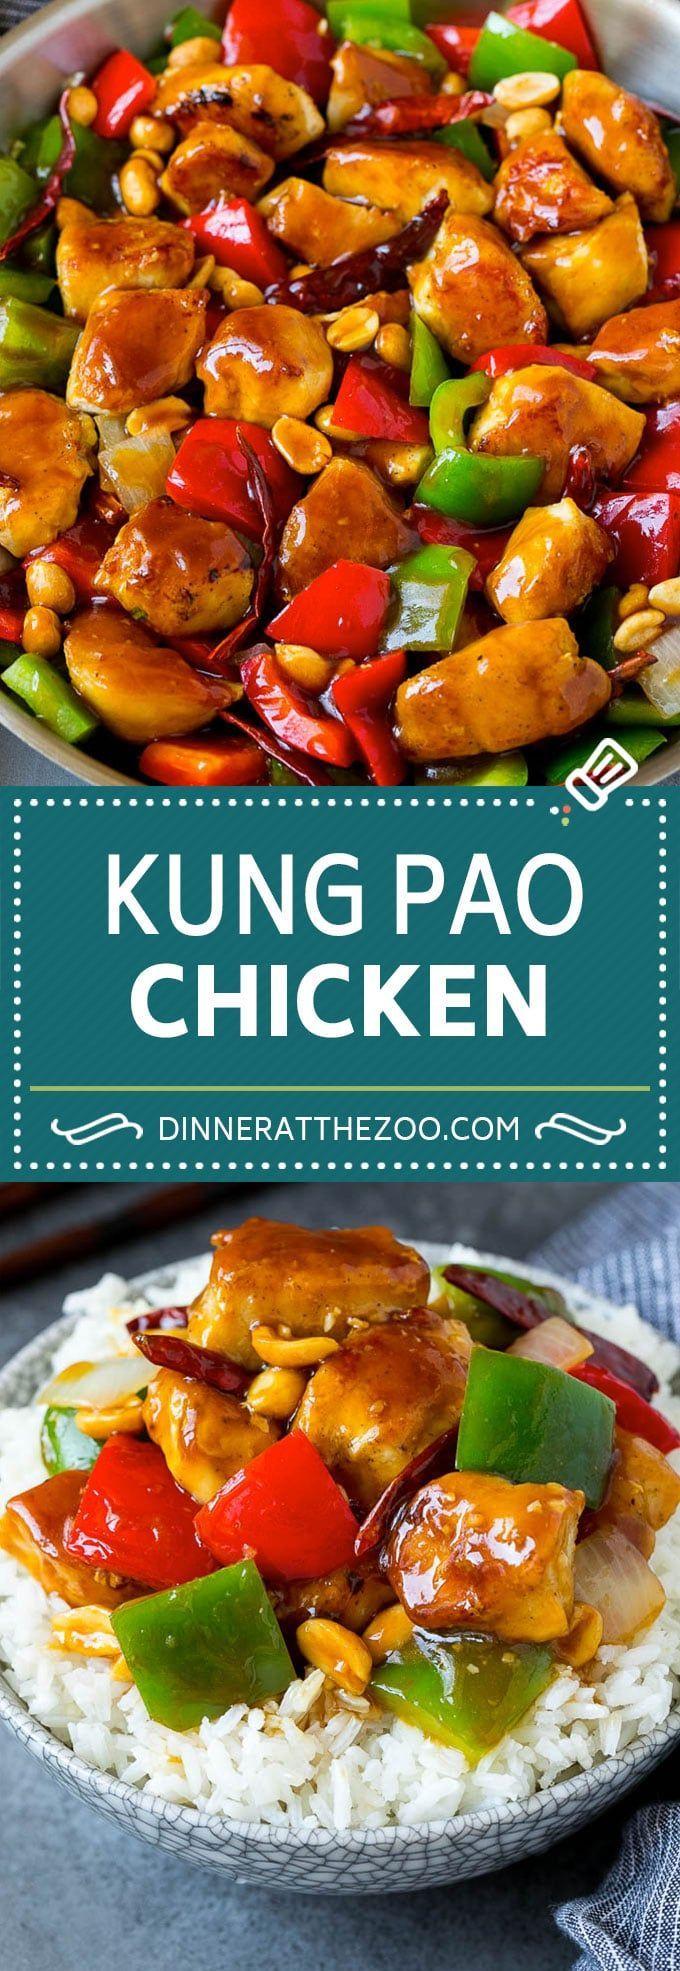 Kung Pao Chicken Recipe  Chicken Stir Fry Kung Pao Chicken Recipe  Chicken Stir Fry